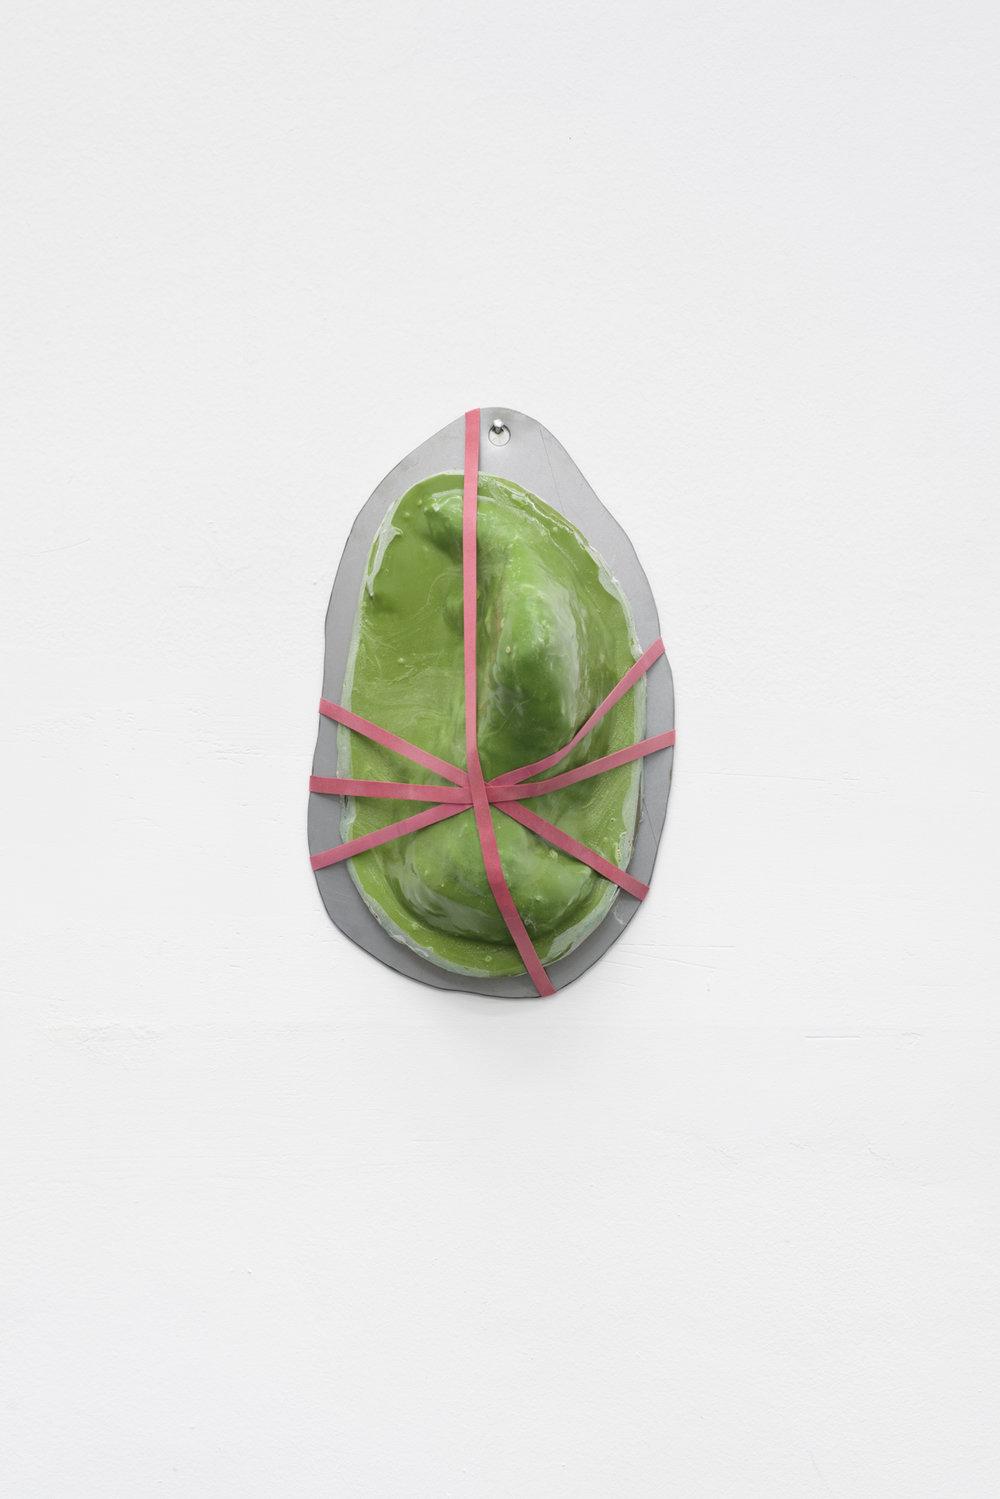 Lena Henke, Eure Frankfurter Küche, 2016, Metal, Sand, silicone, fibreglass, epoxy resin, rubber, Courtesy: Galerie Emanuel Layr